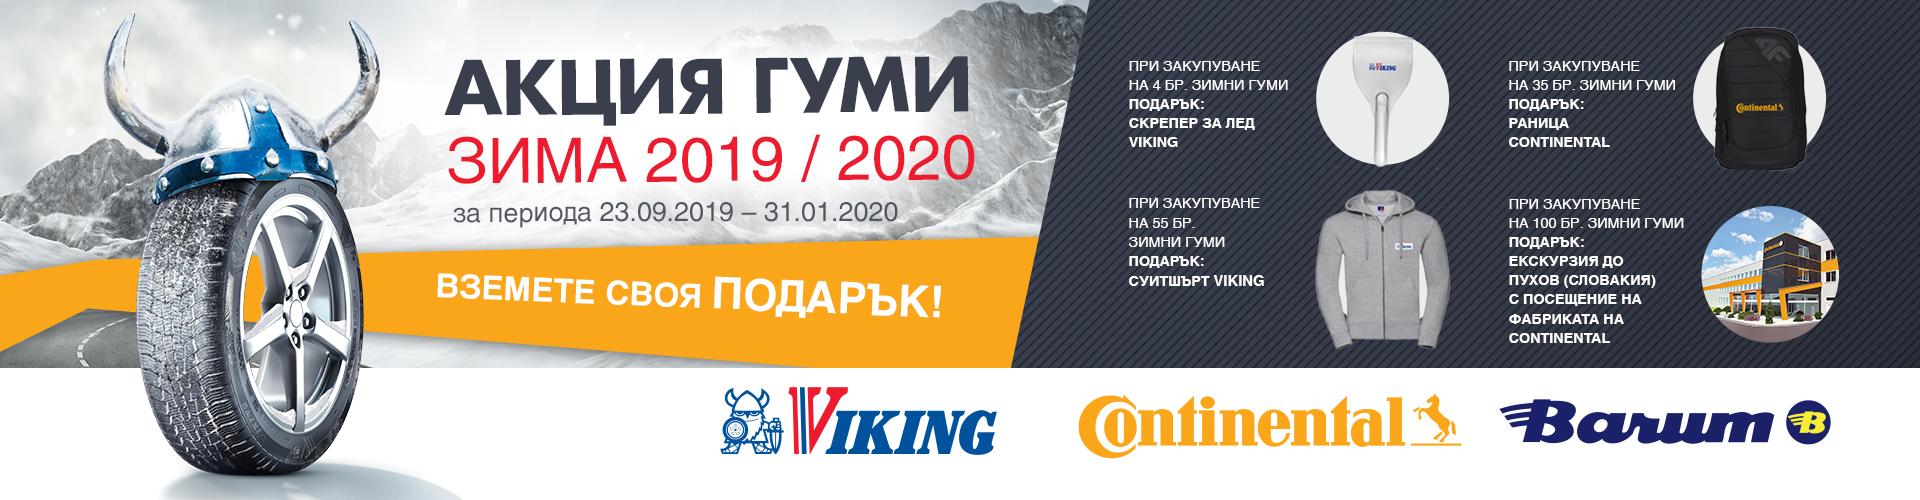 promo_tyres_23.09.2019-31.01.2020_banner.jpg